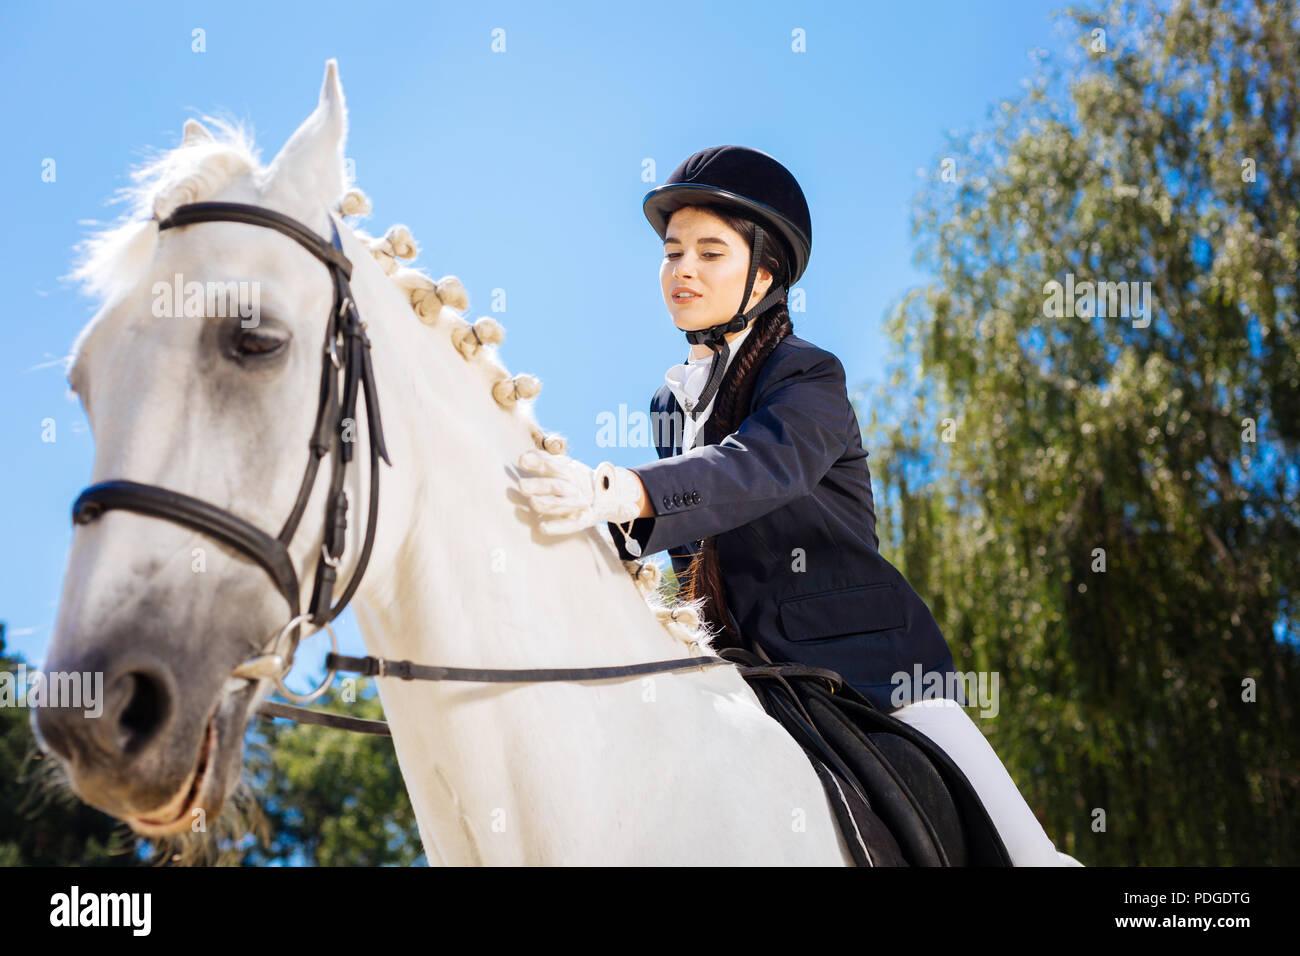 Amar horsewoman acariciar su caballo blanco suave Imagen De Stock